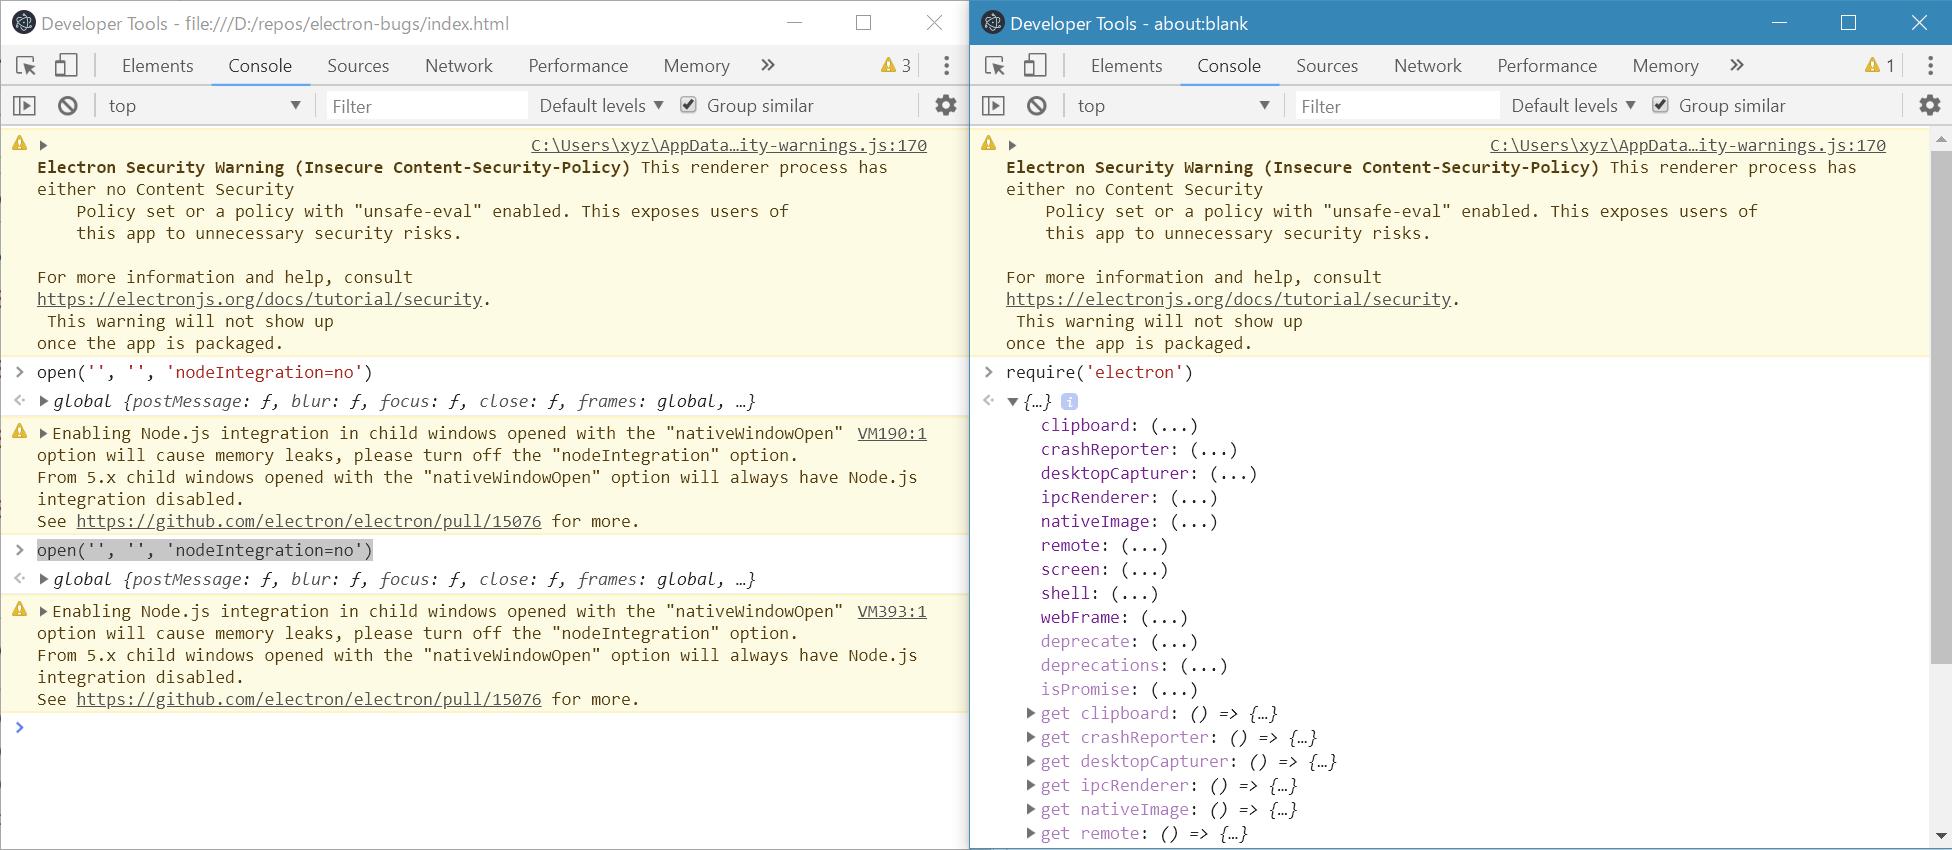 window open with nativeWindowOpen option always enables